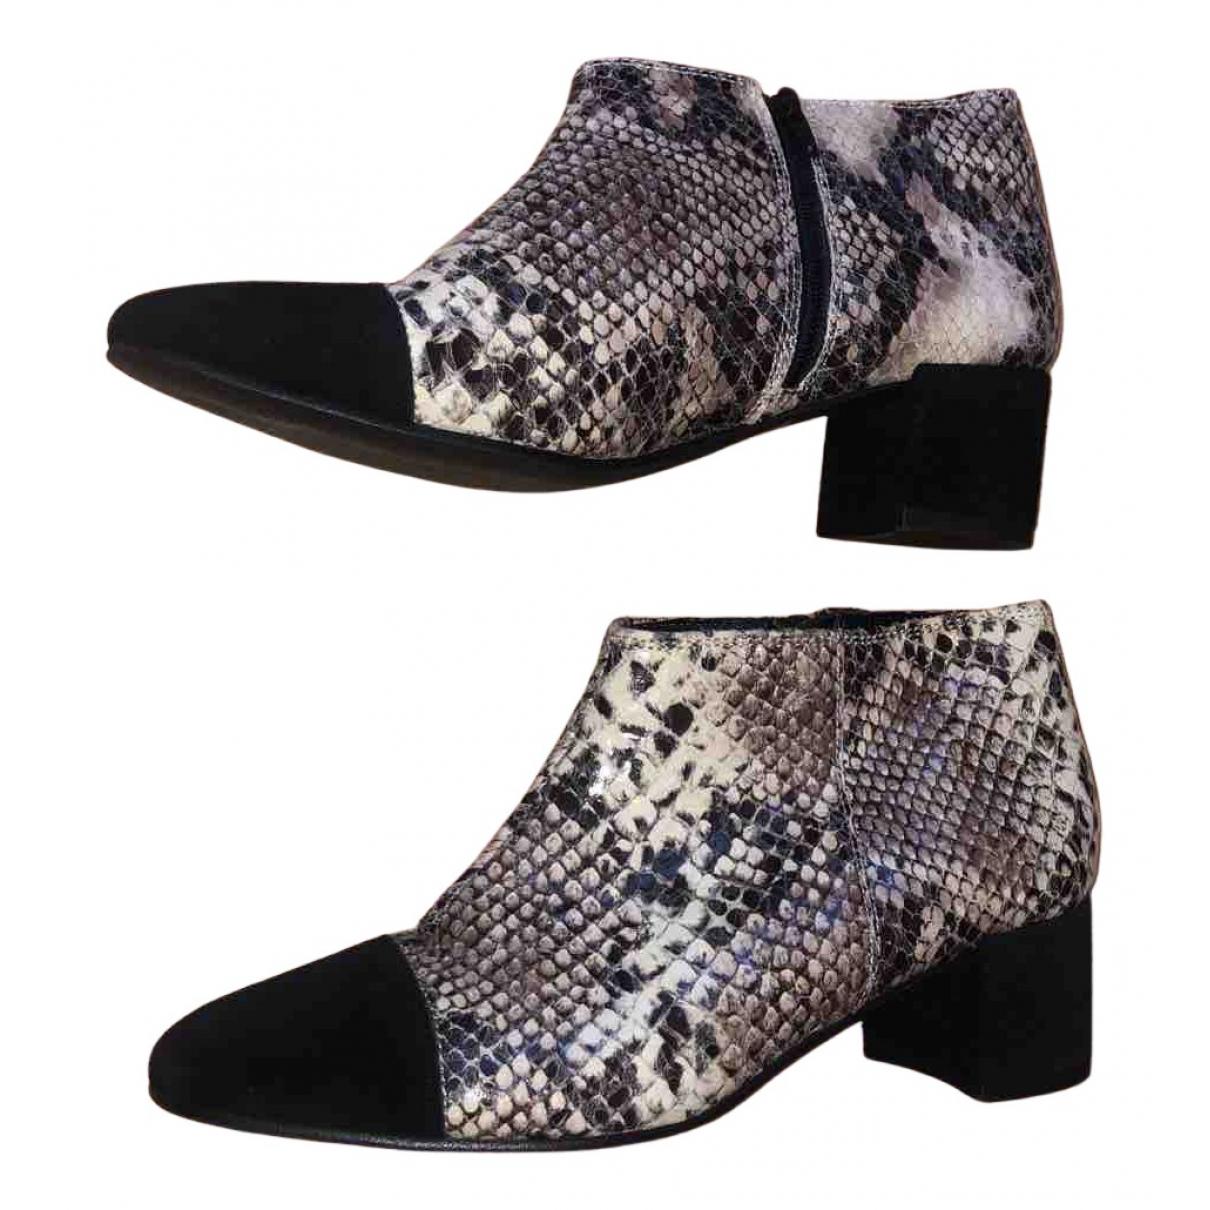 Office London N Beige Leather Boots for Women 4 UK